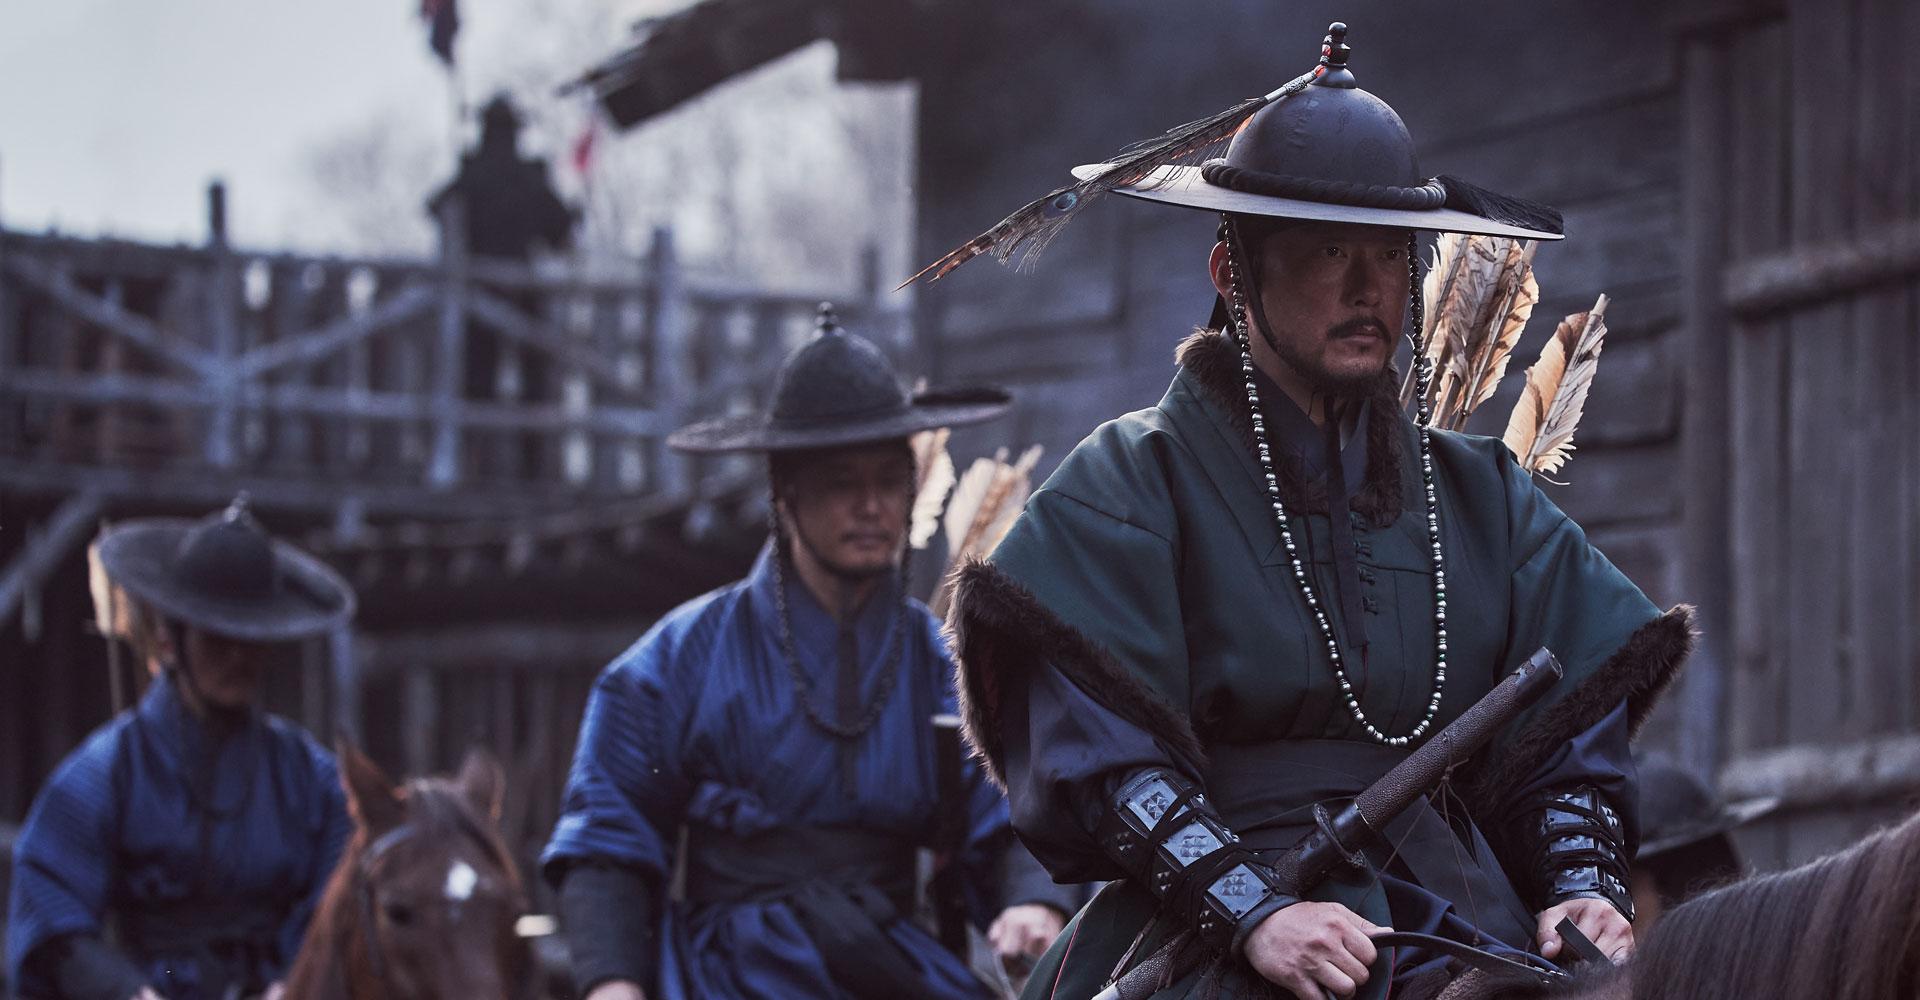 Park Byeong-eun in Kingdom: Ashin of the North